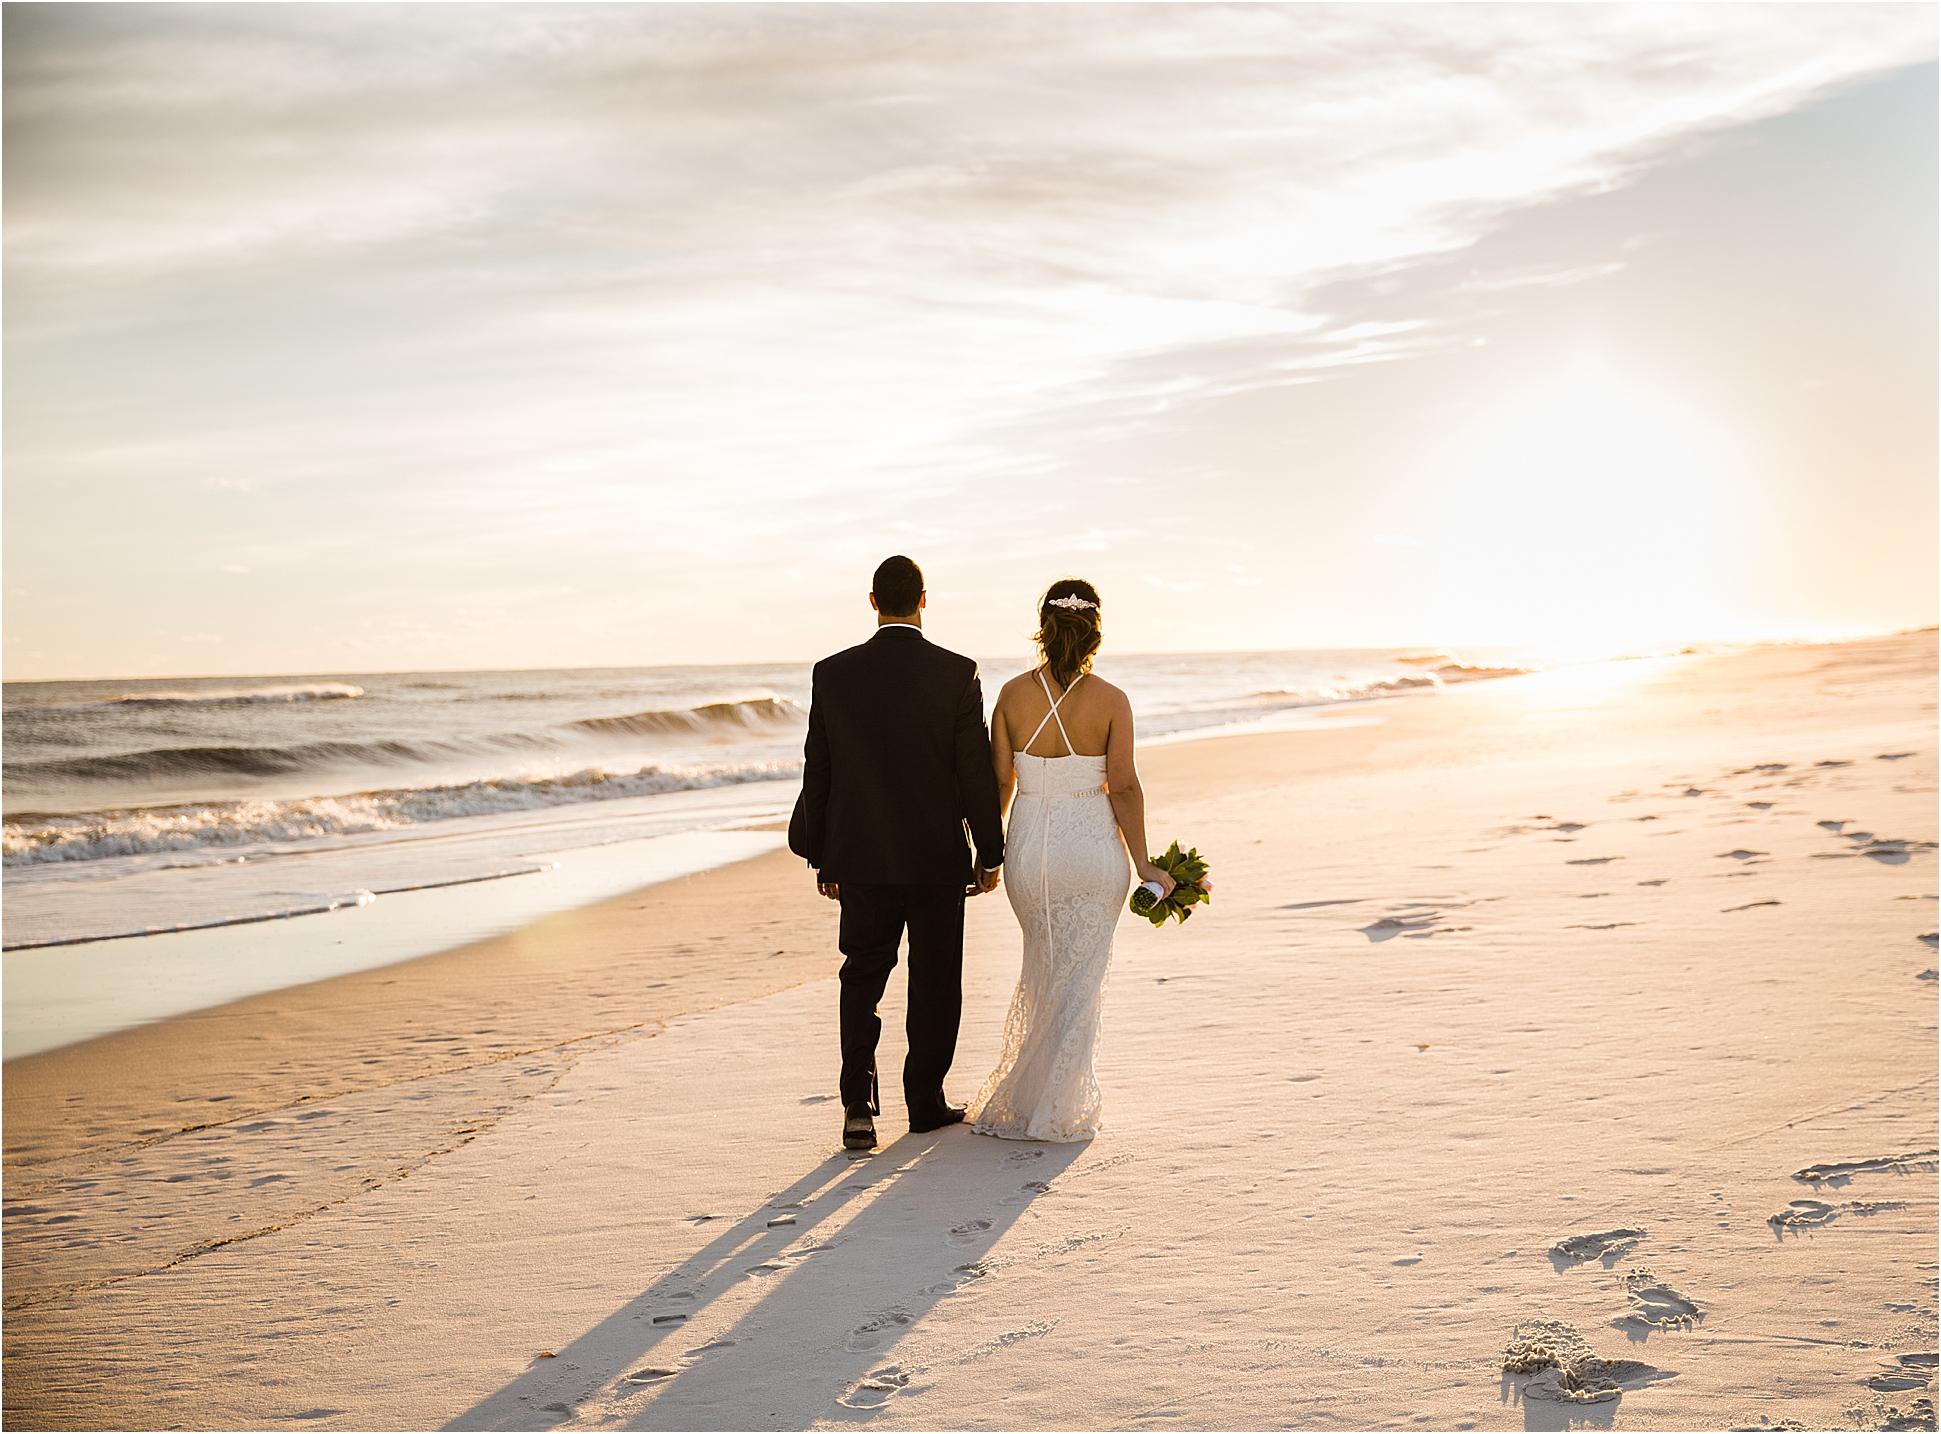 Wedding Locations in Gulf Shores